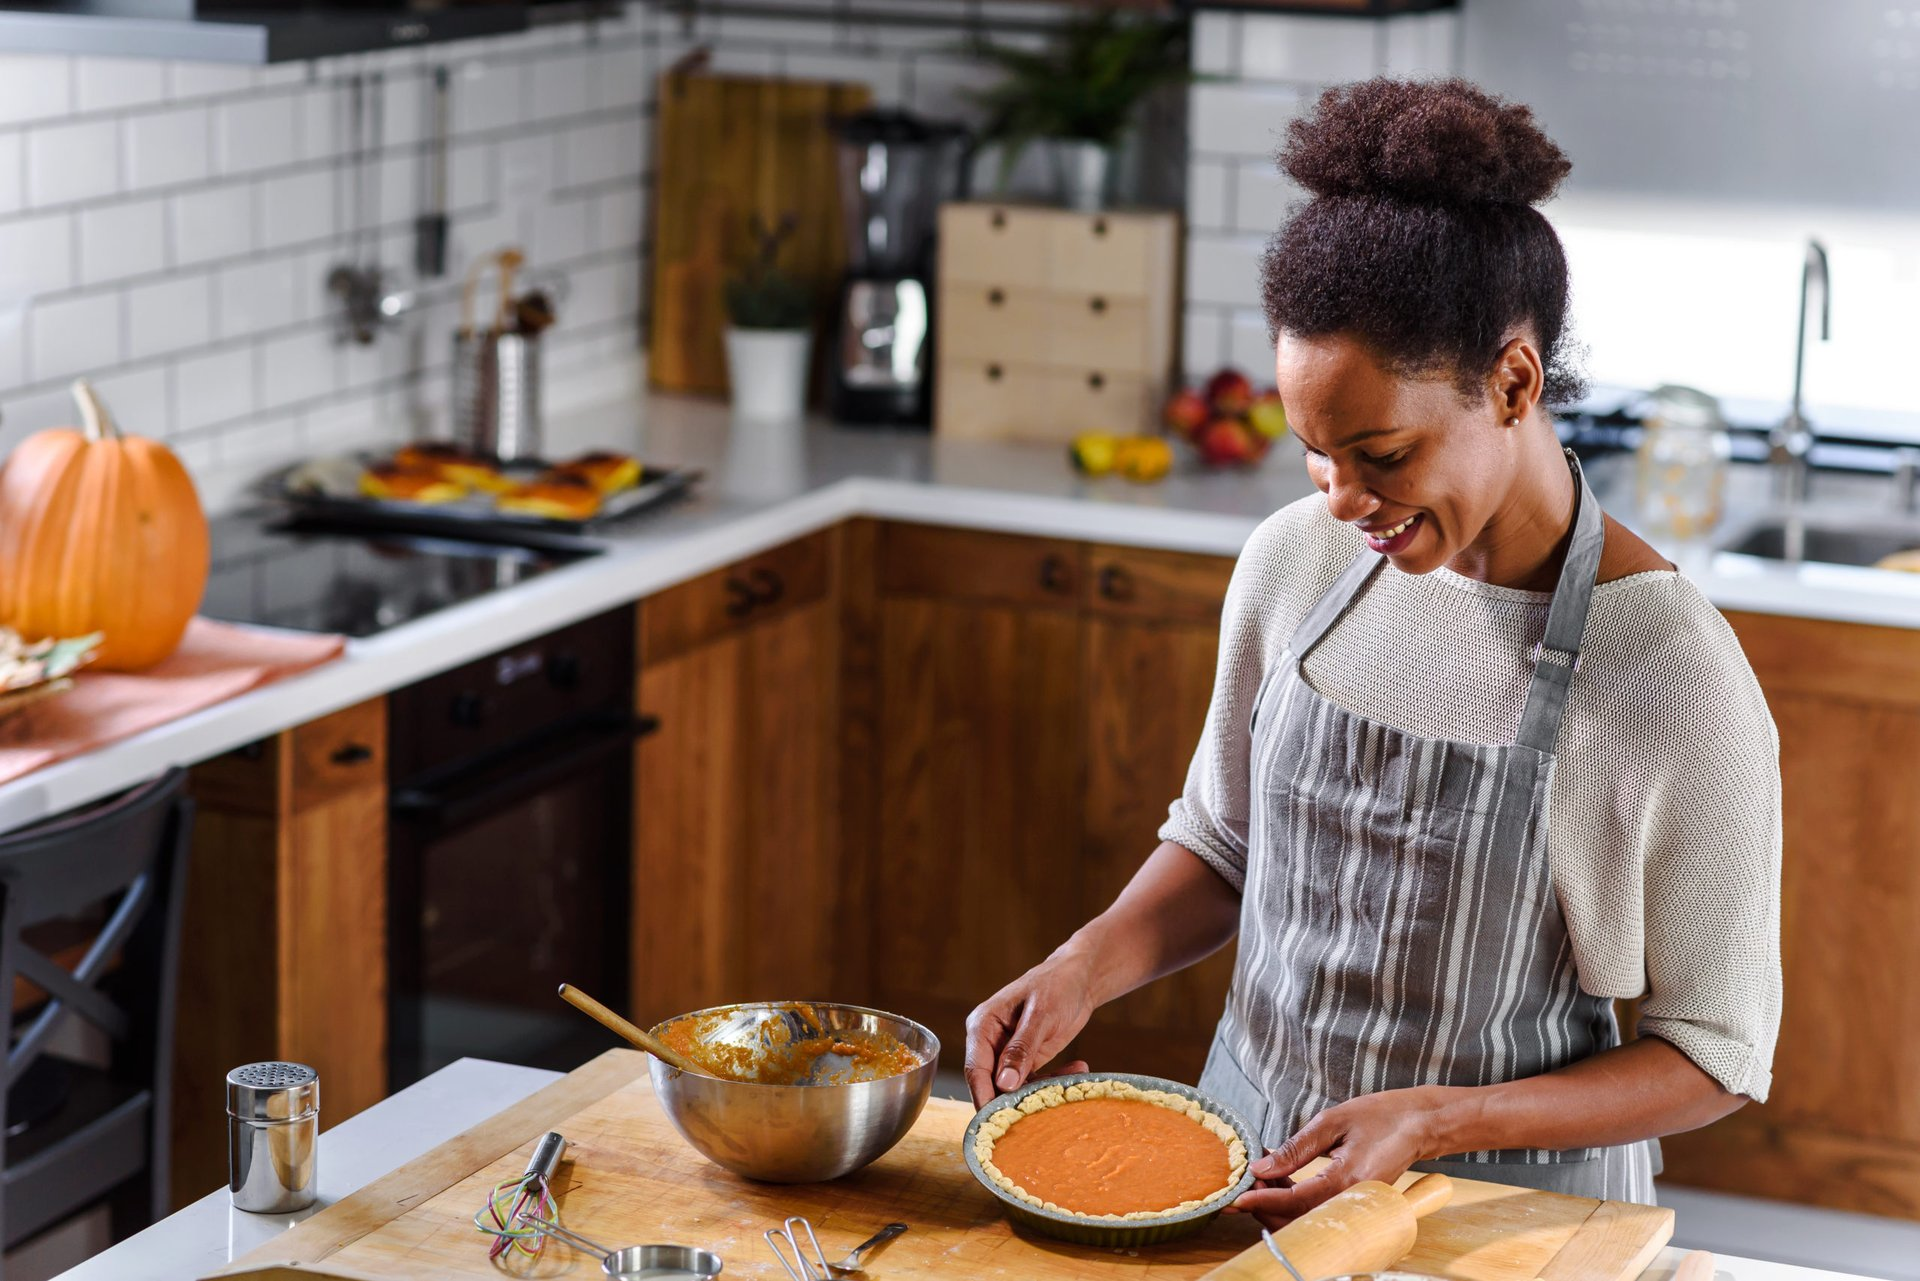 Woman preparing pumpkin pie for holidays